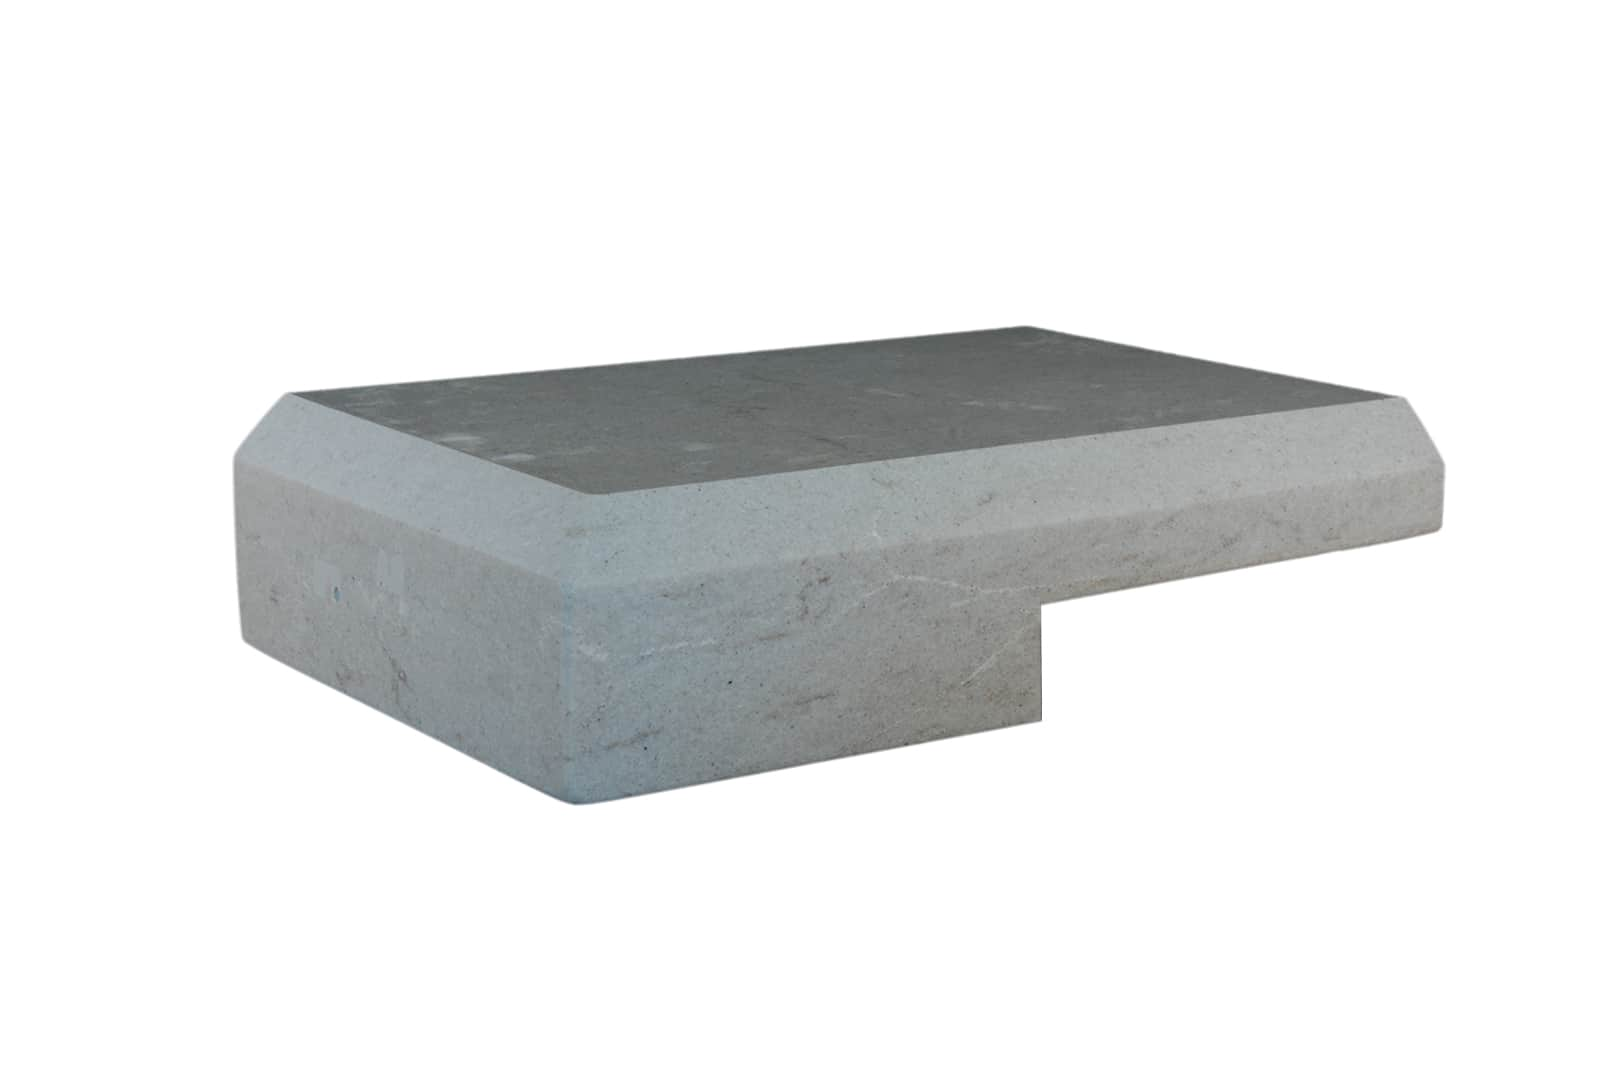 artistic-granite-designs-edges-fabrications-1_5x3_8x3_8-bevel-6076